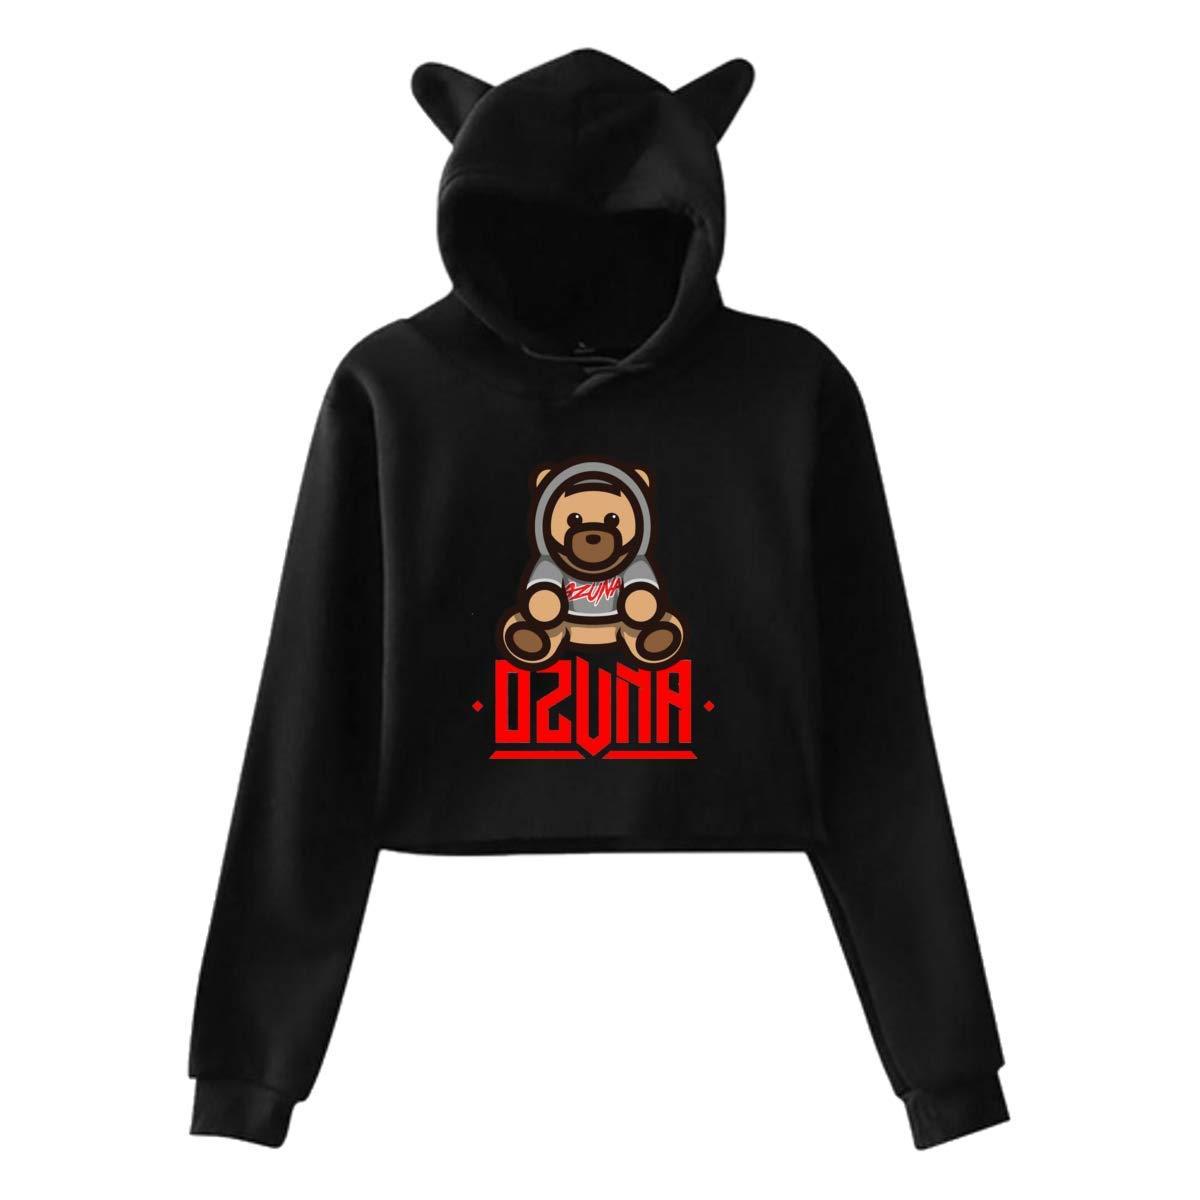 Female Print with Ozuna Logo Novelty Cat Ear Hooded Sweatshirts